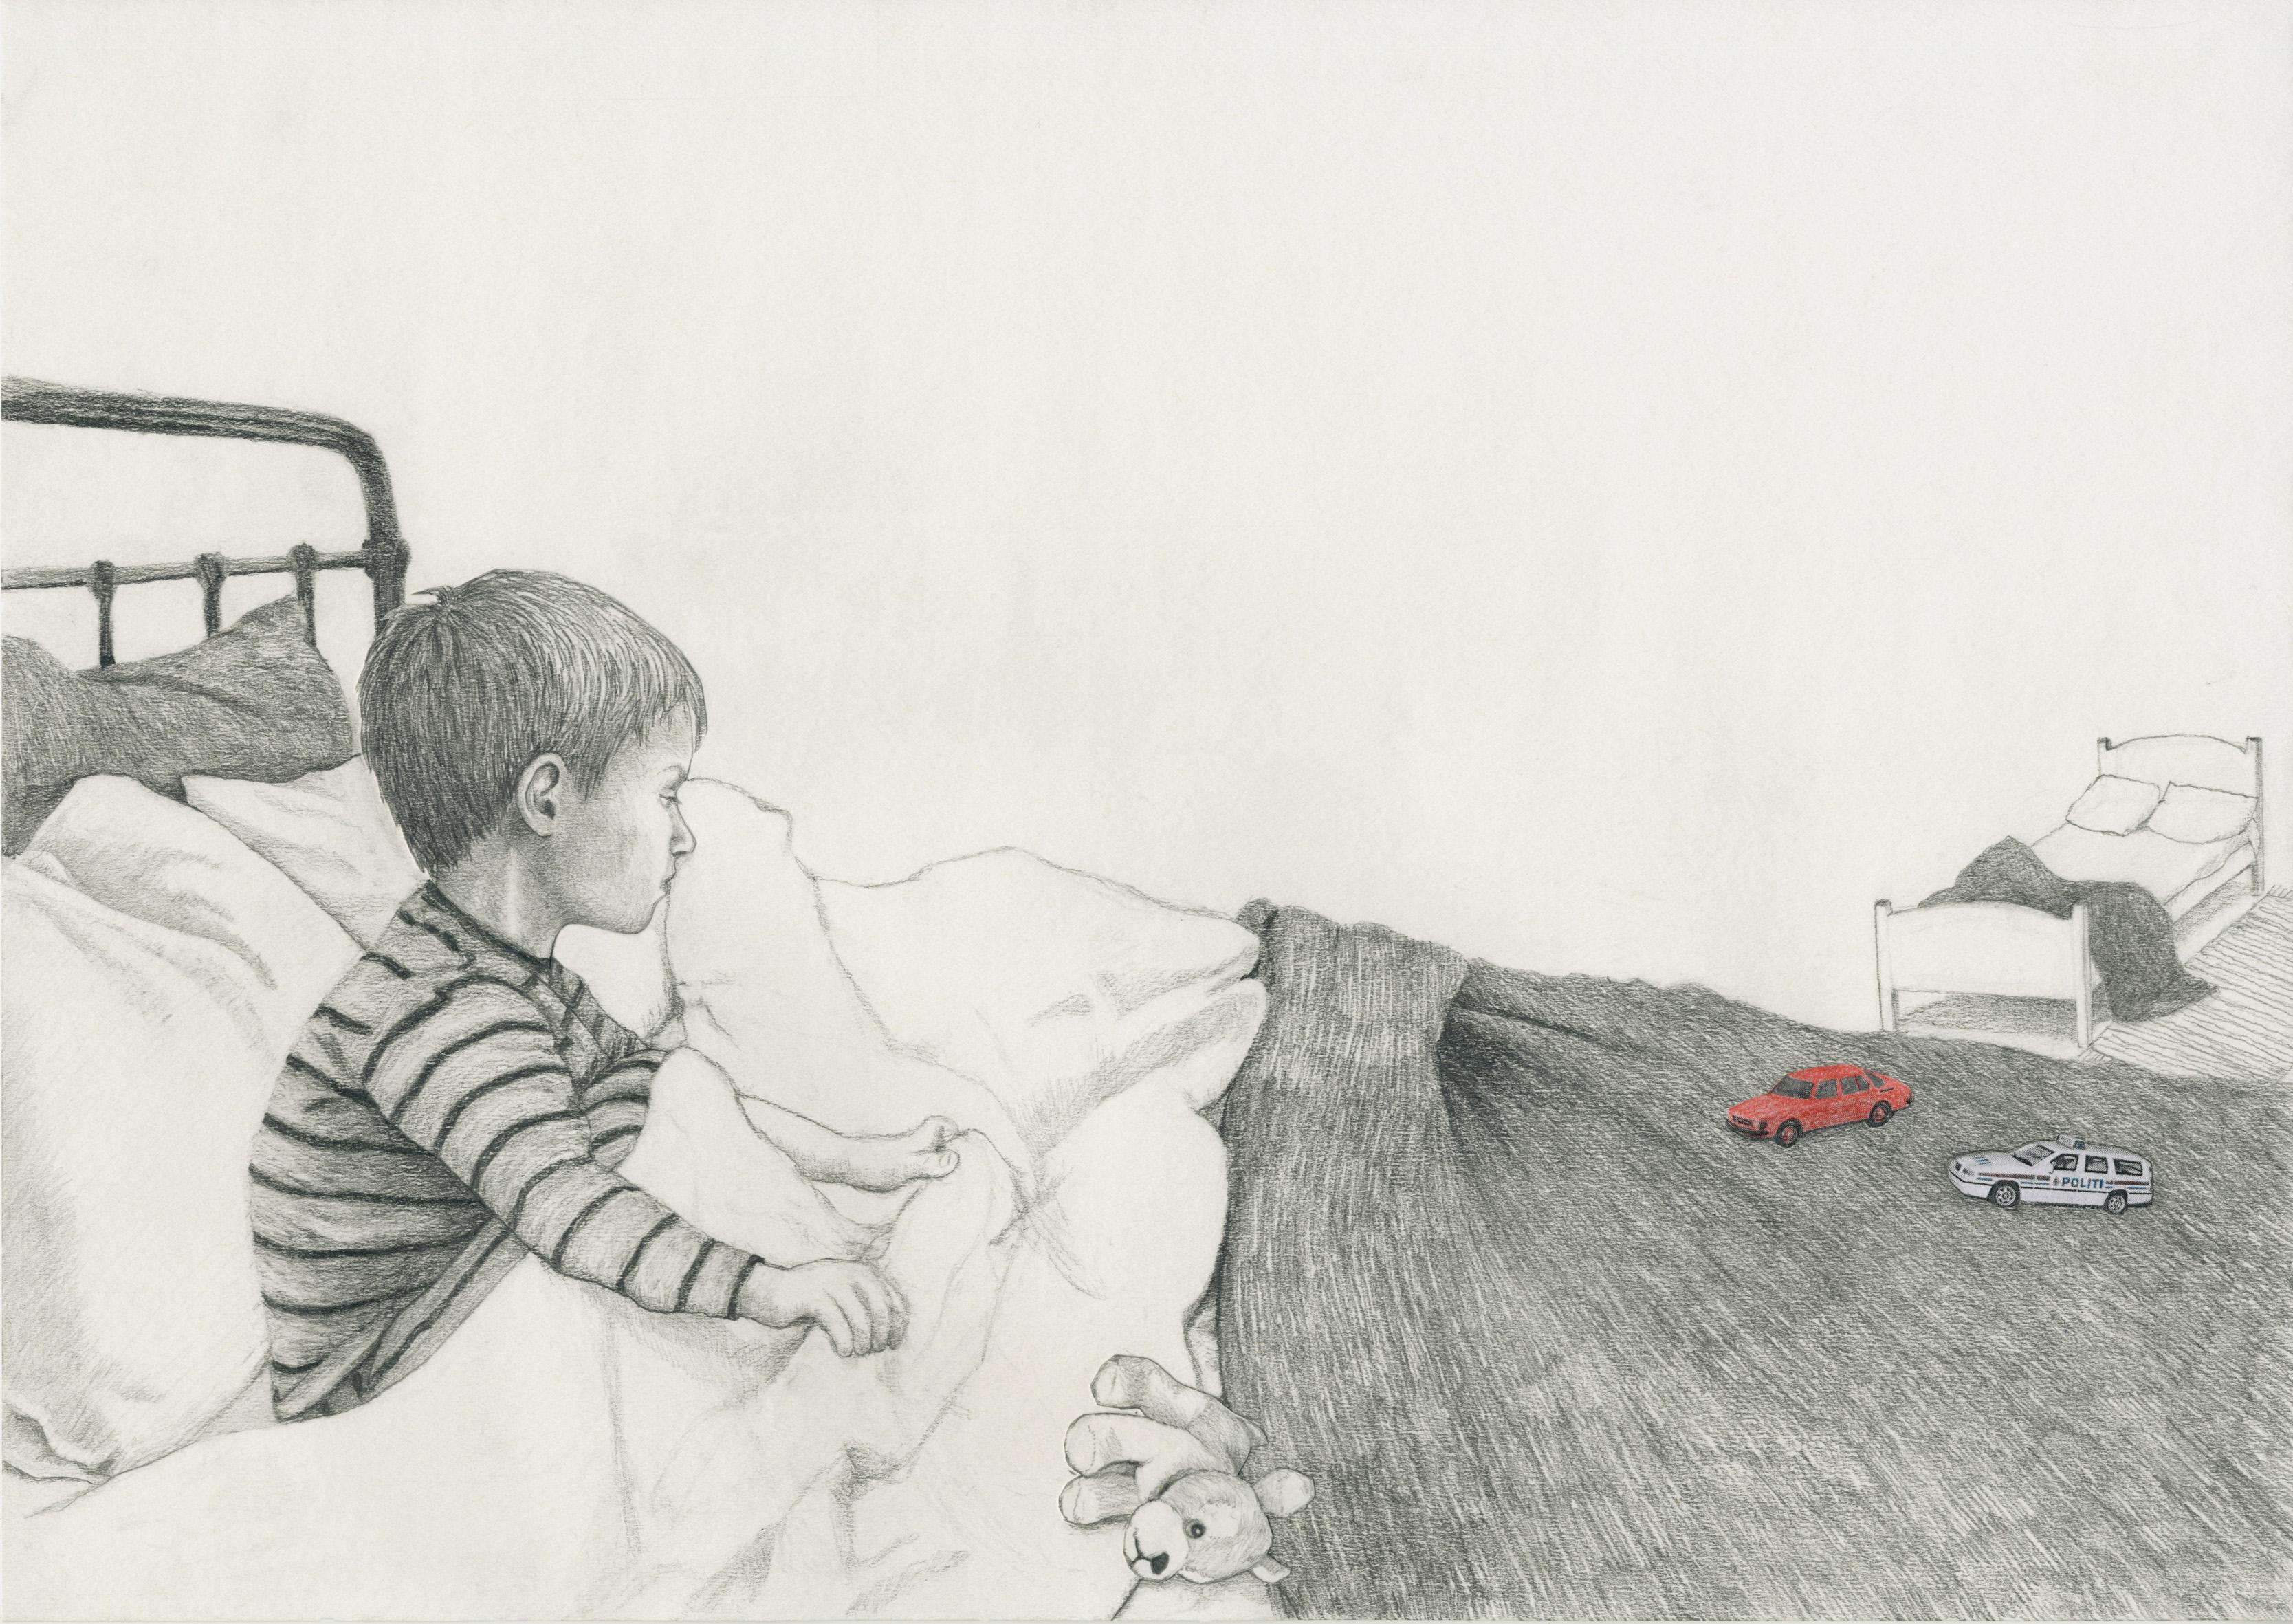 Illustrasjon fra Hauk: Susanna Kajermo